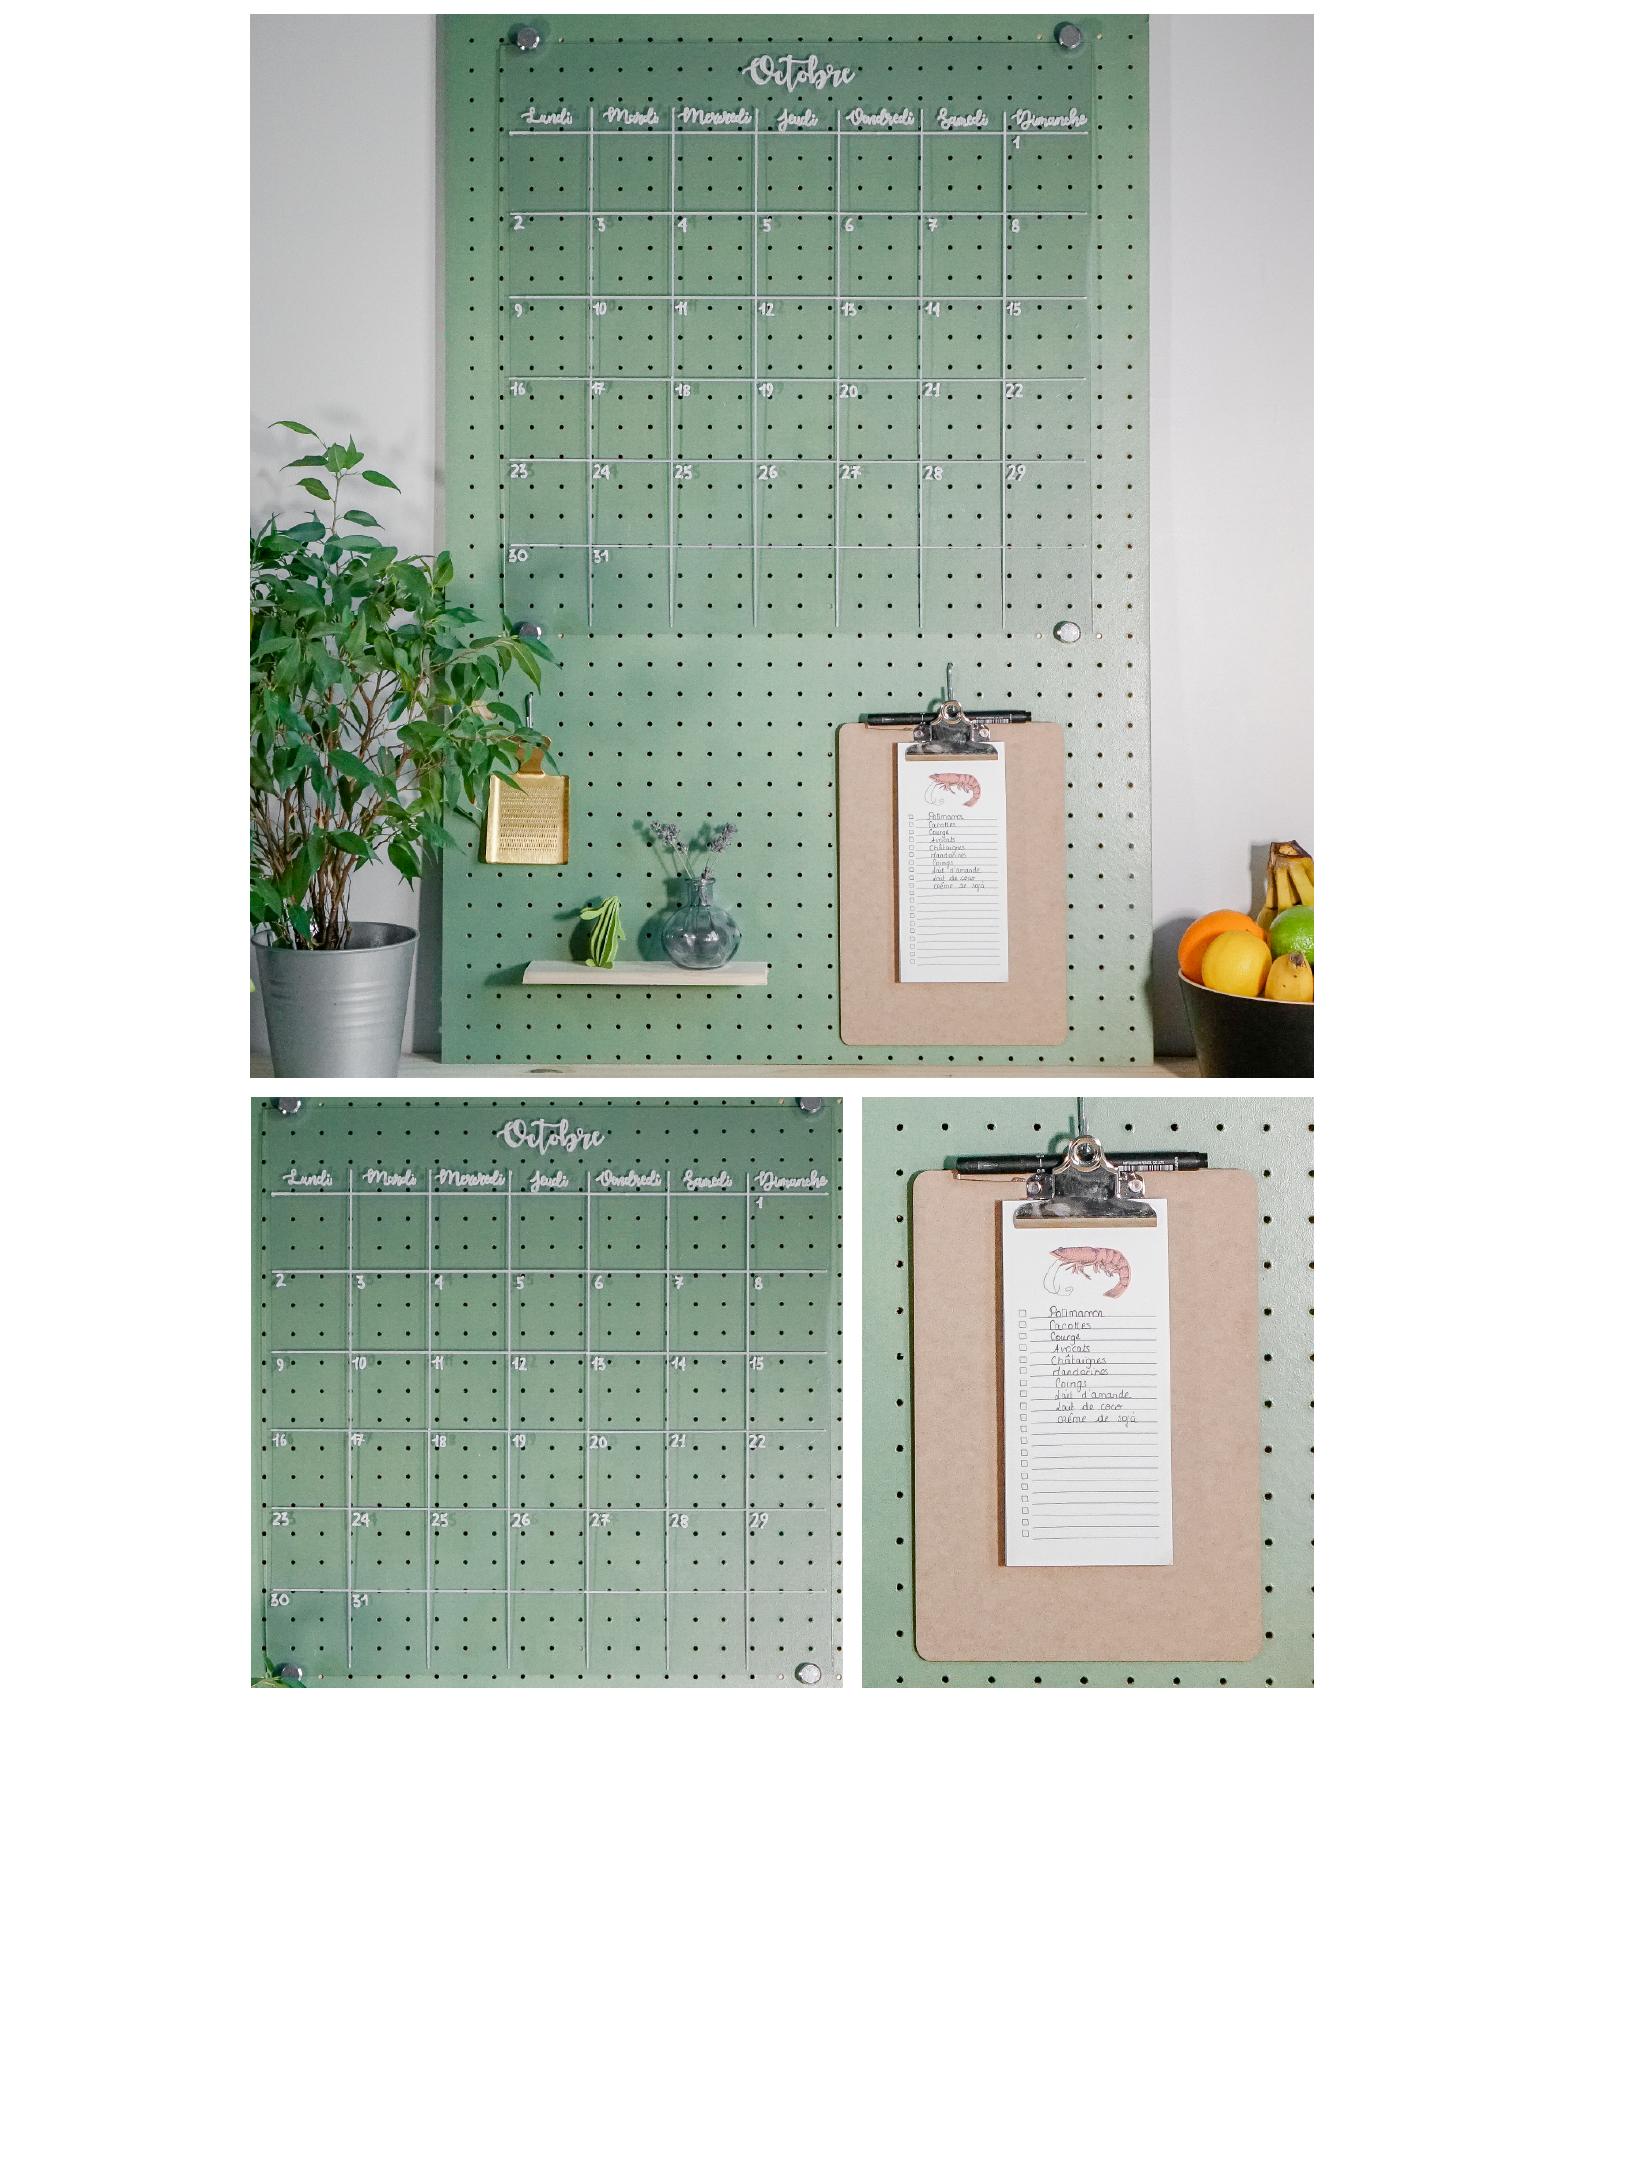 diy organisation l 39 organisateur mural les petites p pites. Black Bedroom Furniture Sets. Home Design Ideas